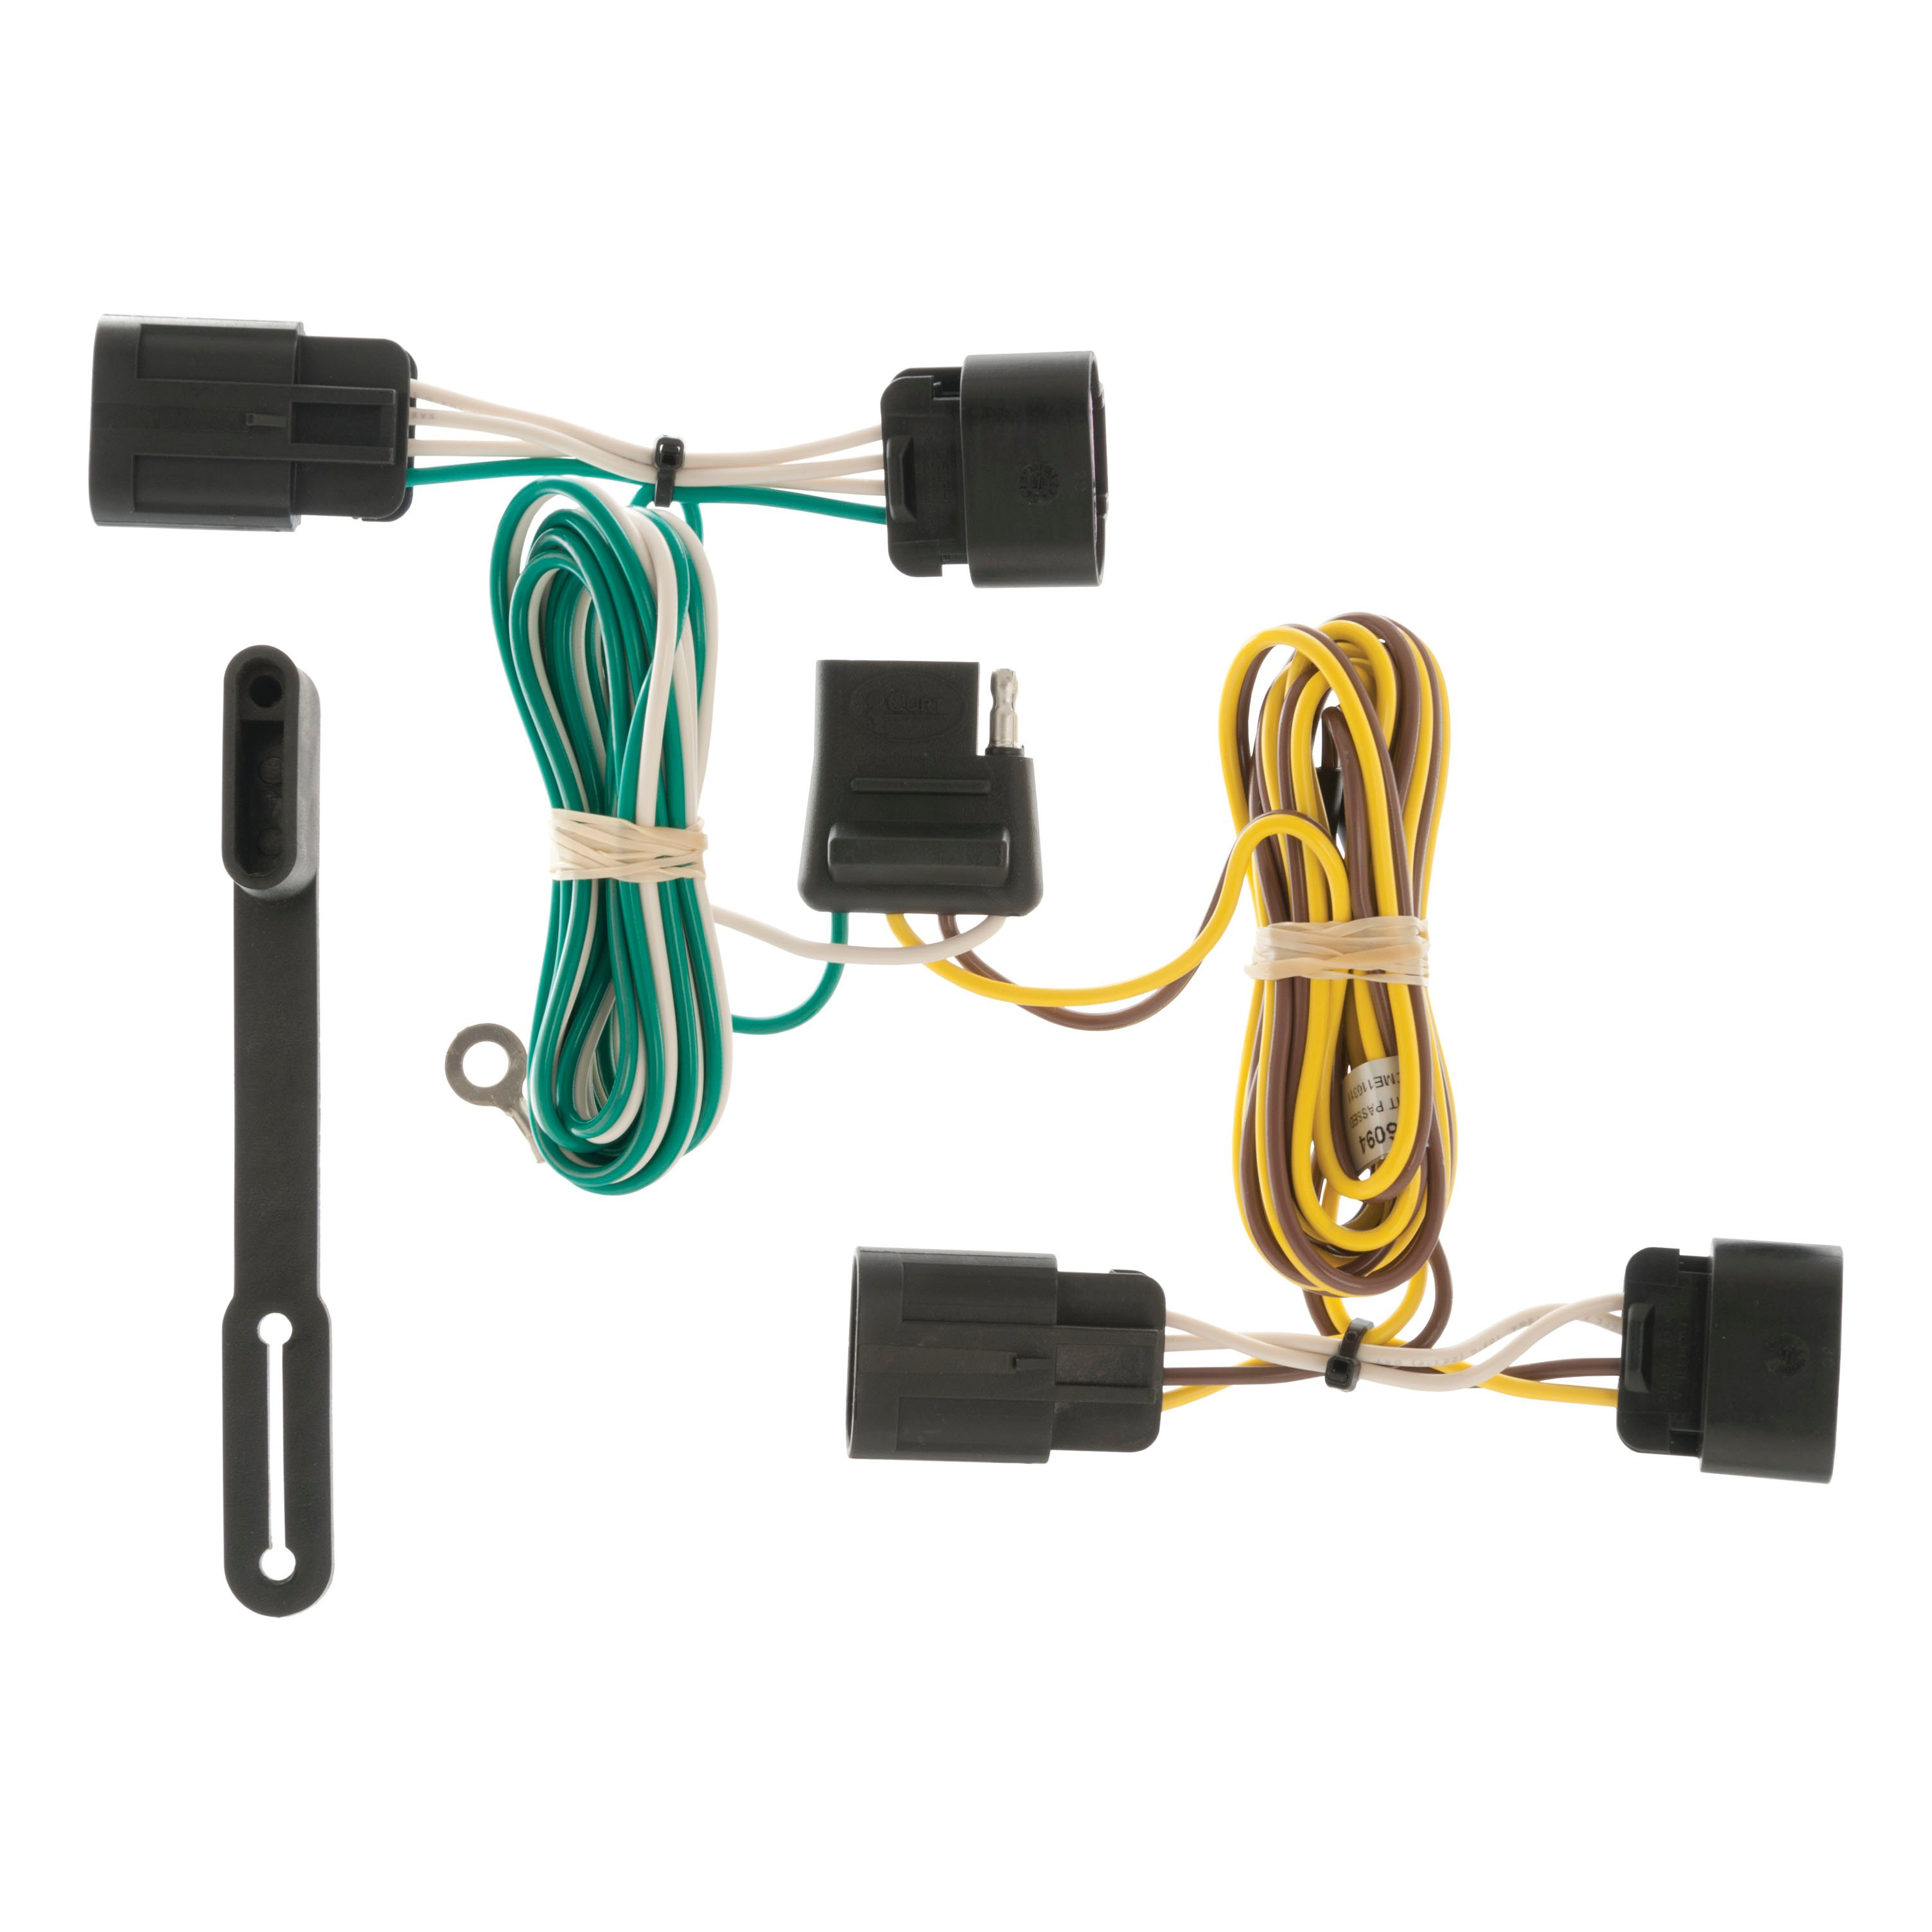 gmc terrain wiring harness wiring diagram for light switch \u2022 2008 jeep patriot trailer wiring curt 56094 wiring harness for 2010 2017 chevrolet equinox gmc rh ebay com 2007 gmc acadia